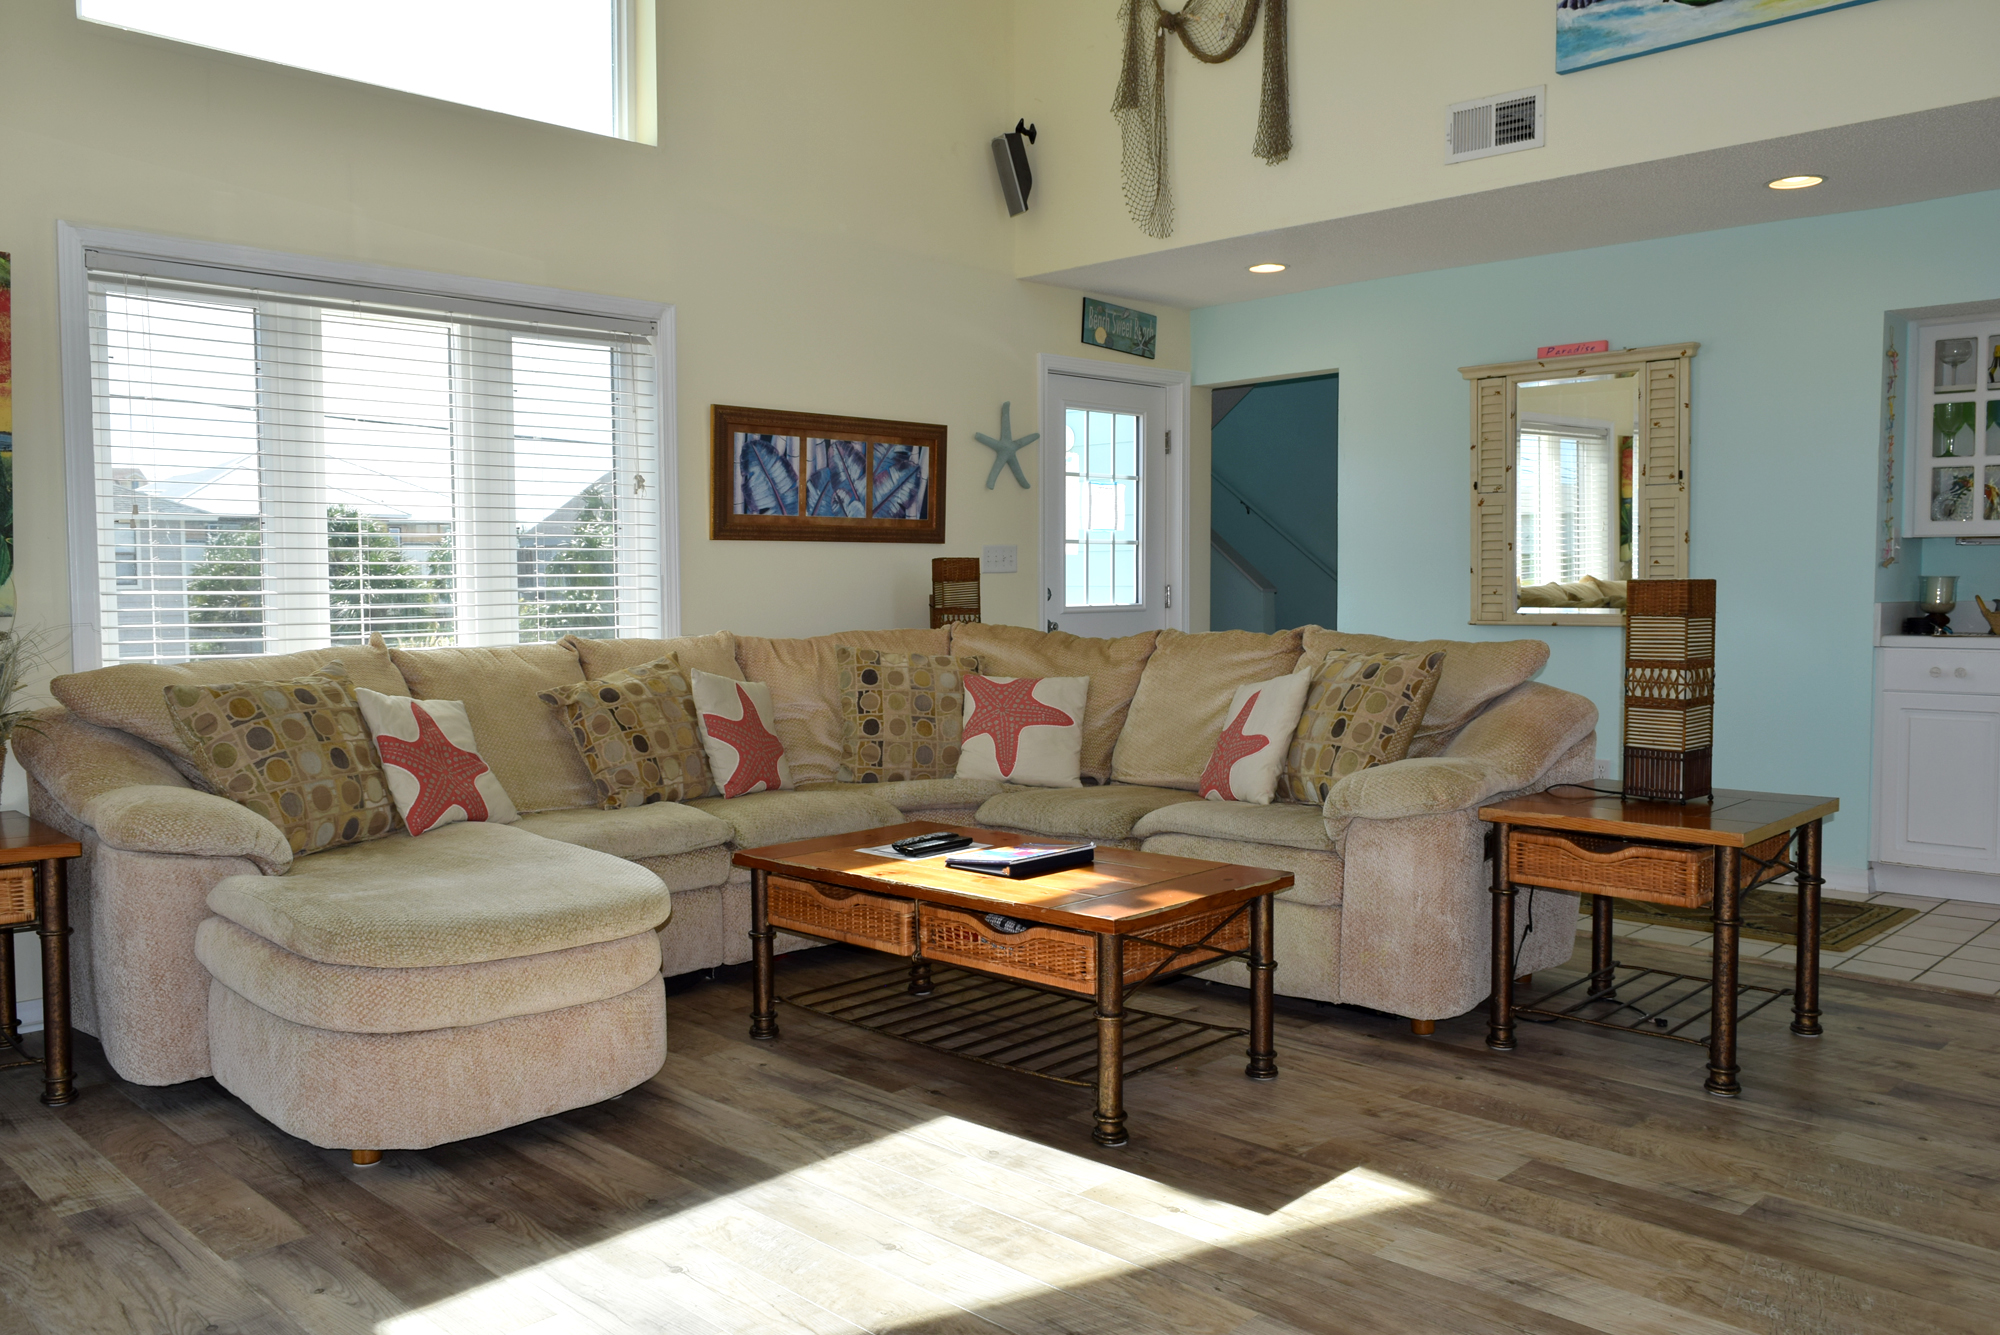 Maldonado 1103 House/Cottage rental in Pensacola Beach House Rentals in Pensacola Beach Florida - #6